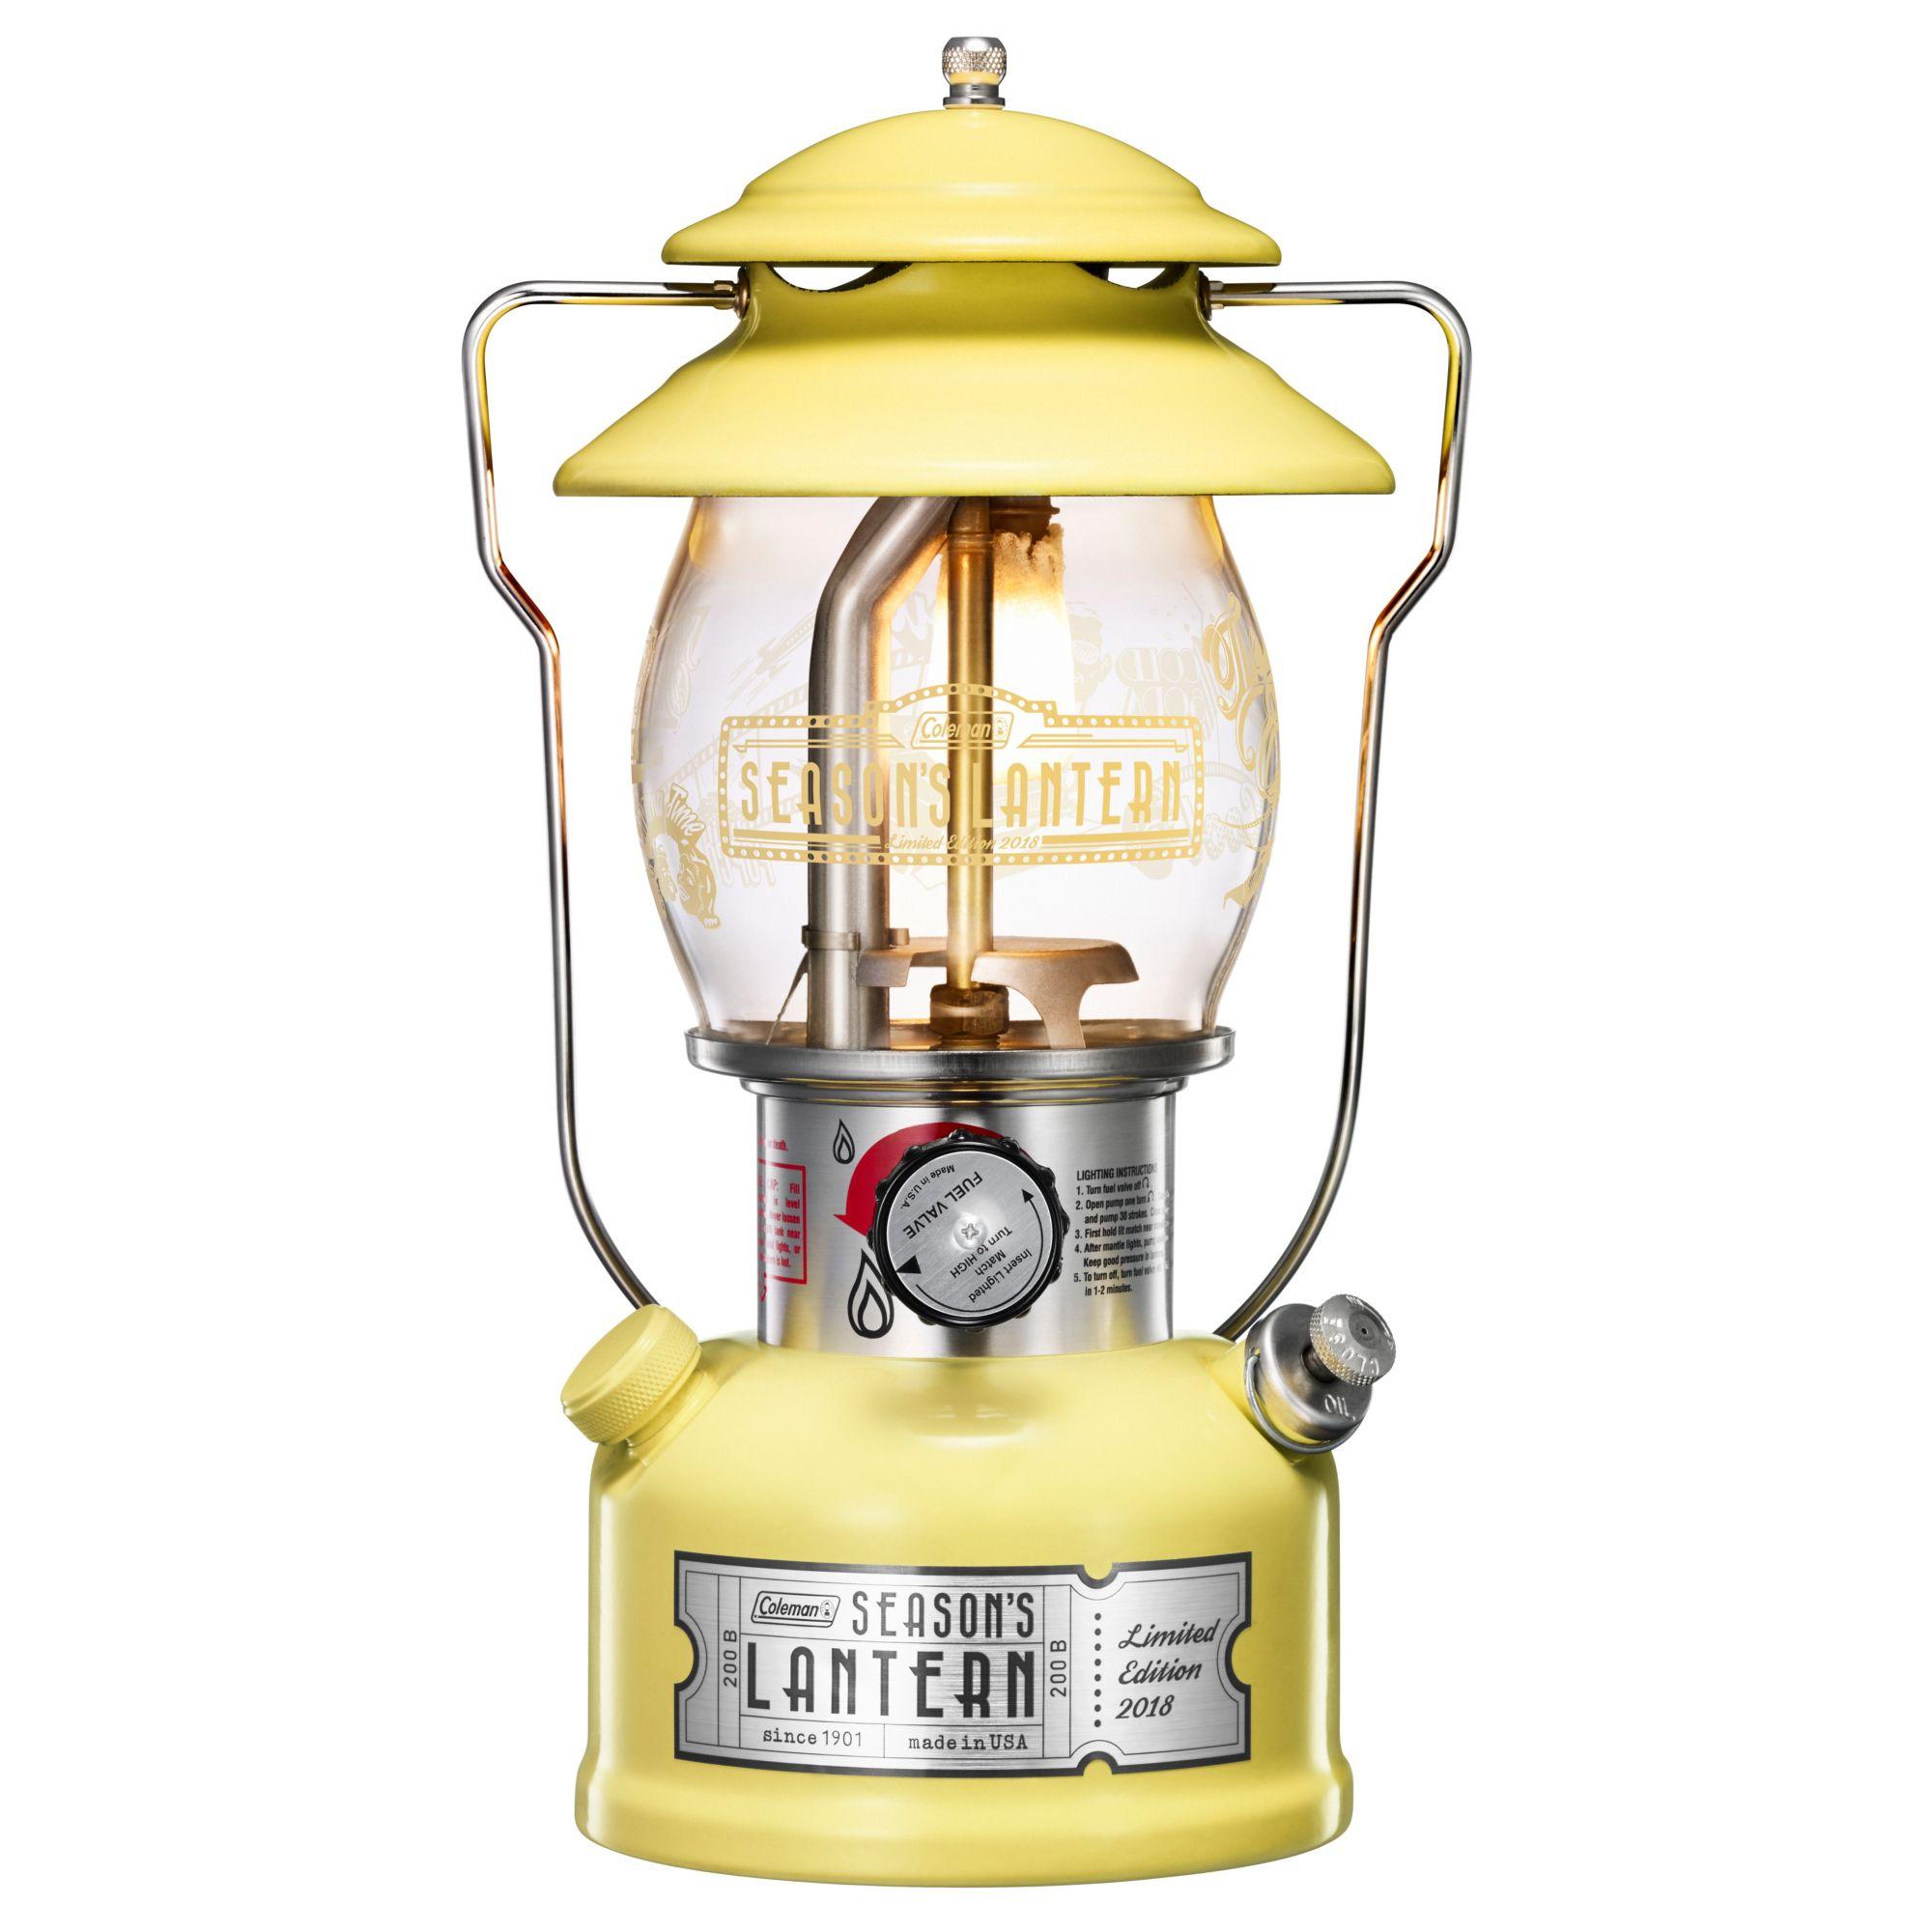 Coleman Seasons Limited Edition Fuel Ed Lantern